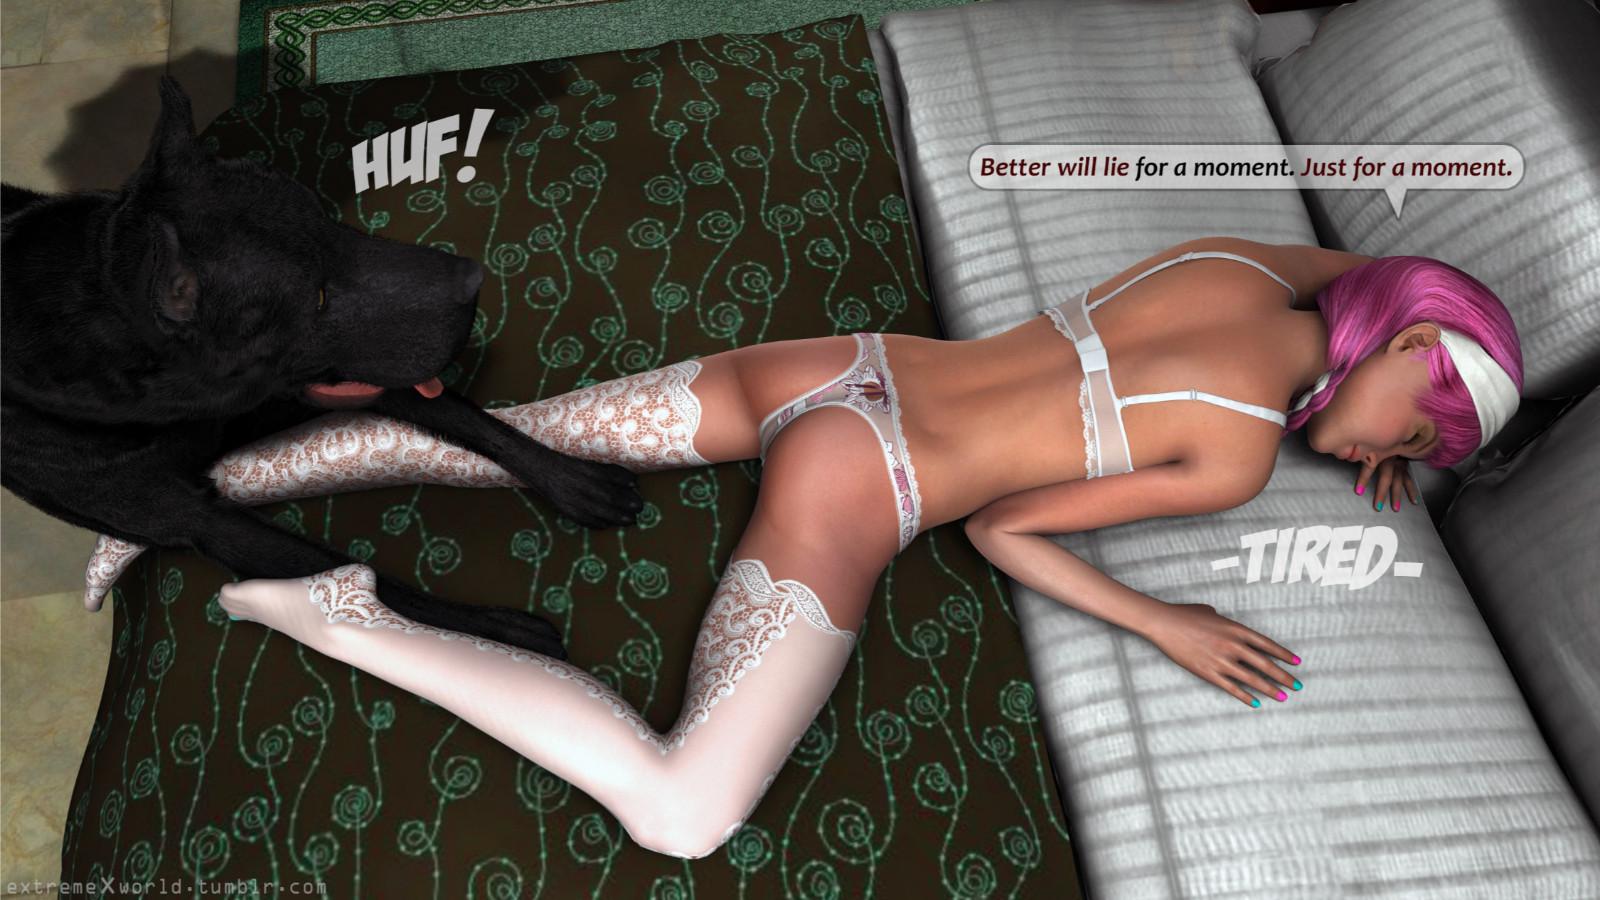 Extremexworld  Wedding  3D Animal Porn Comics-7265